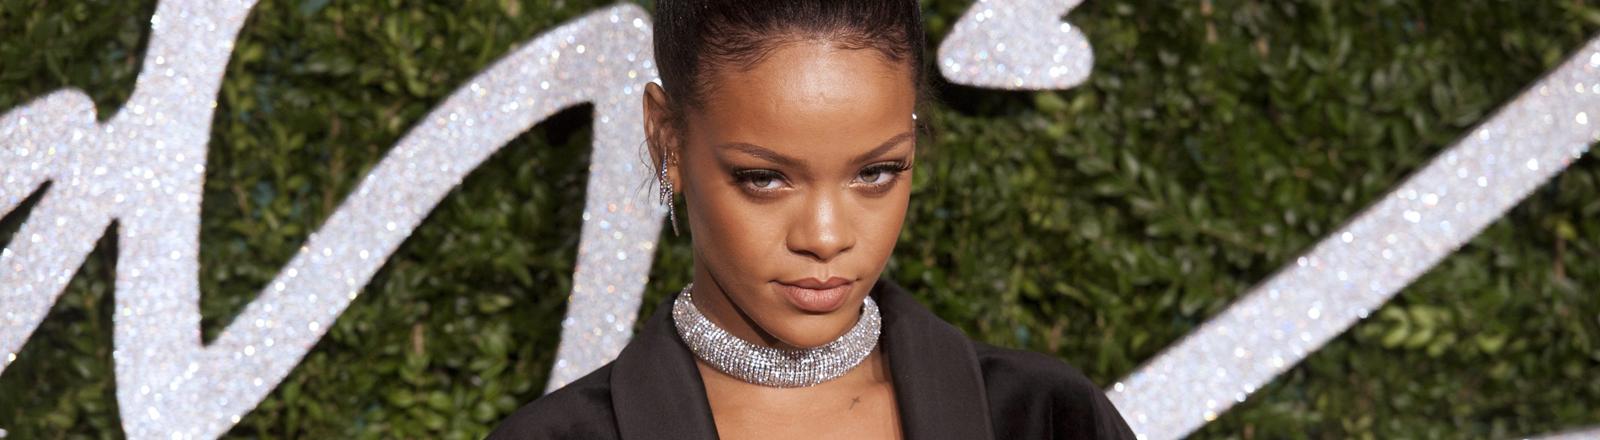 Rihanna bei den British Fashion Awards im Coliseum Theatre in London